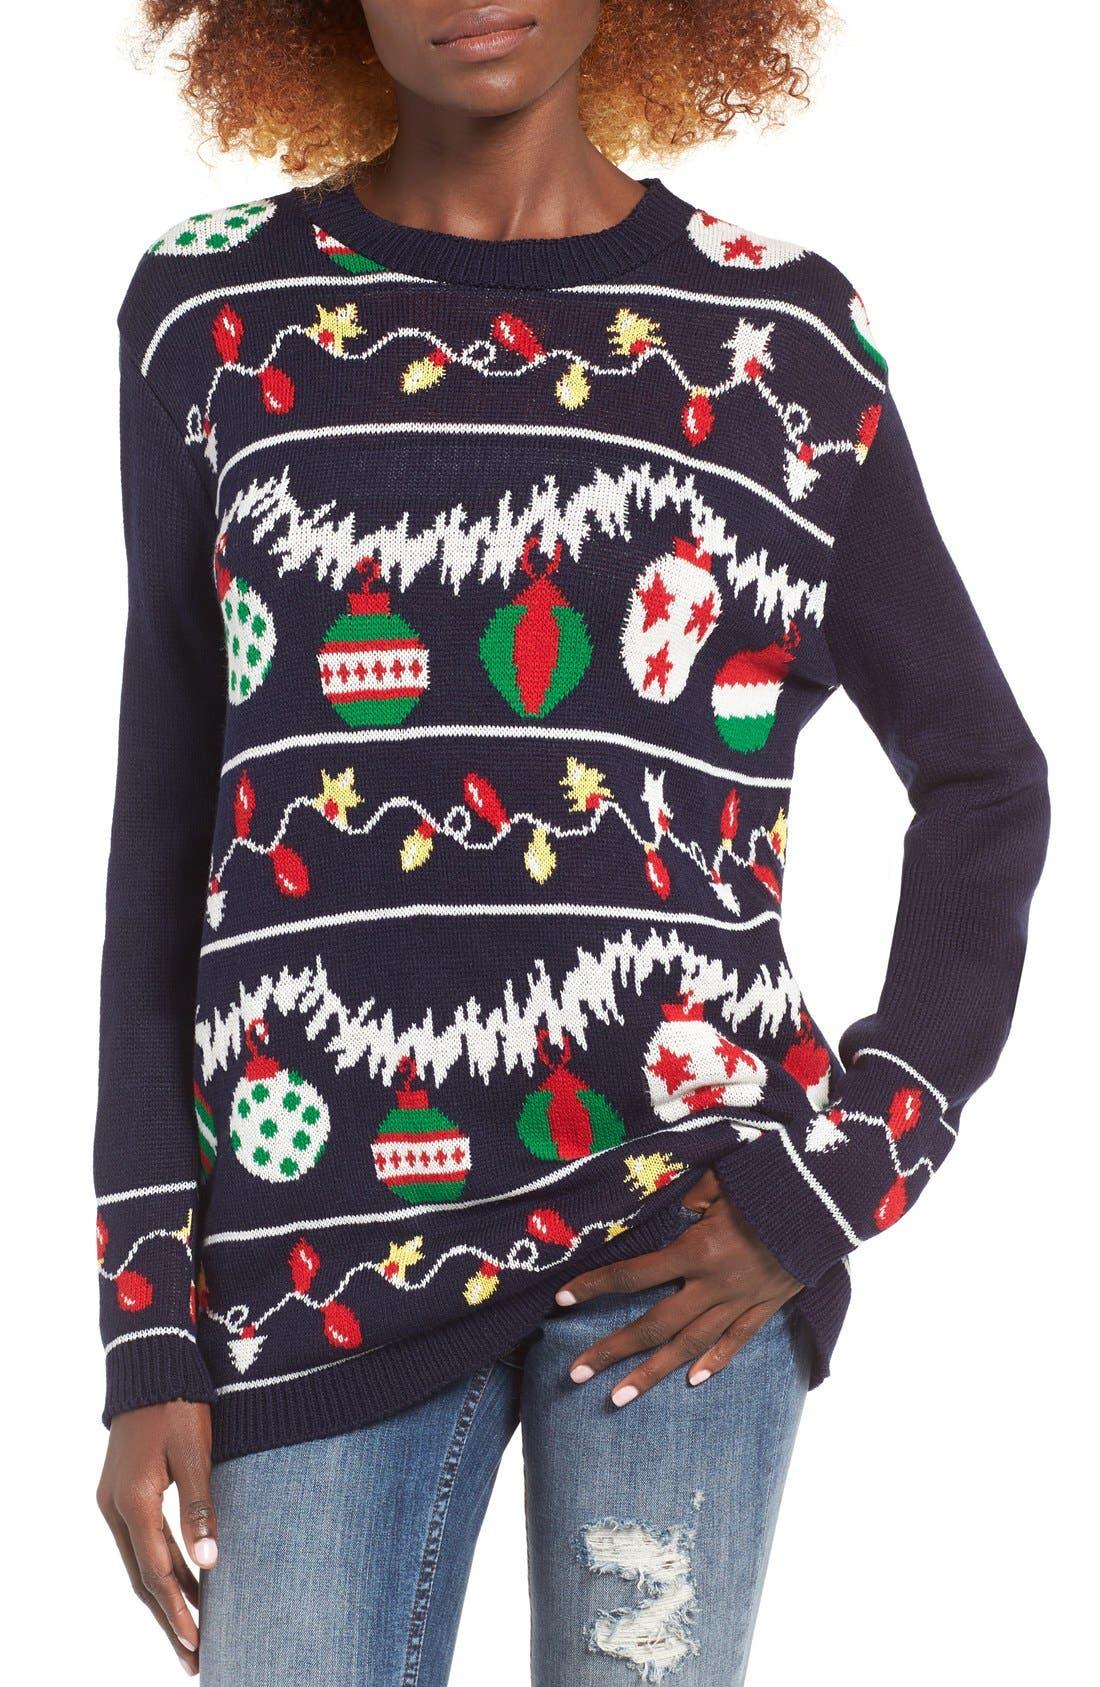 Main Image - Cotton Emporium Ornament Christmas Sweater